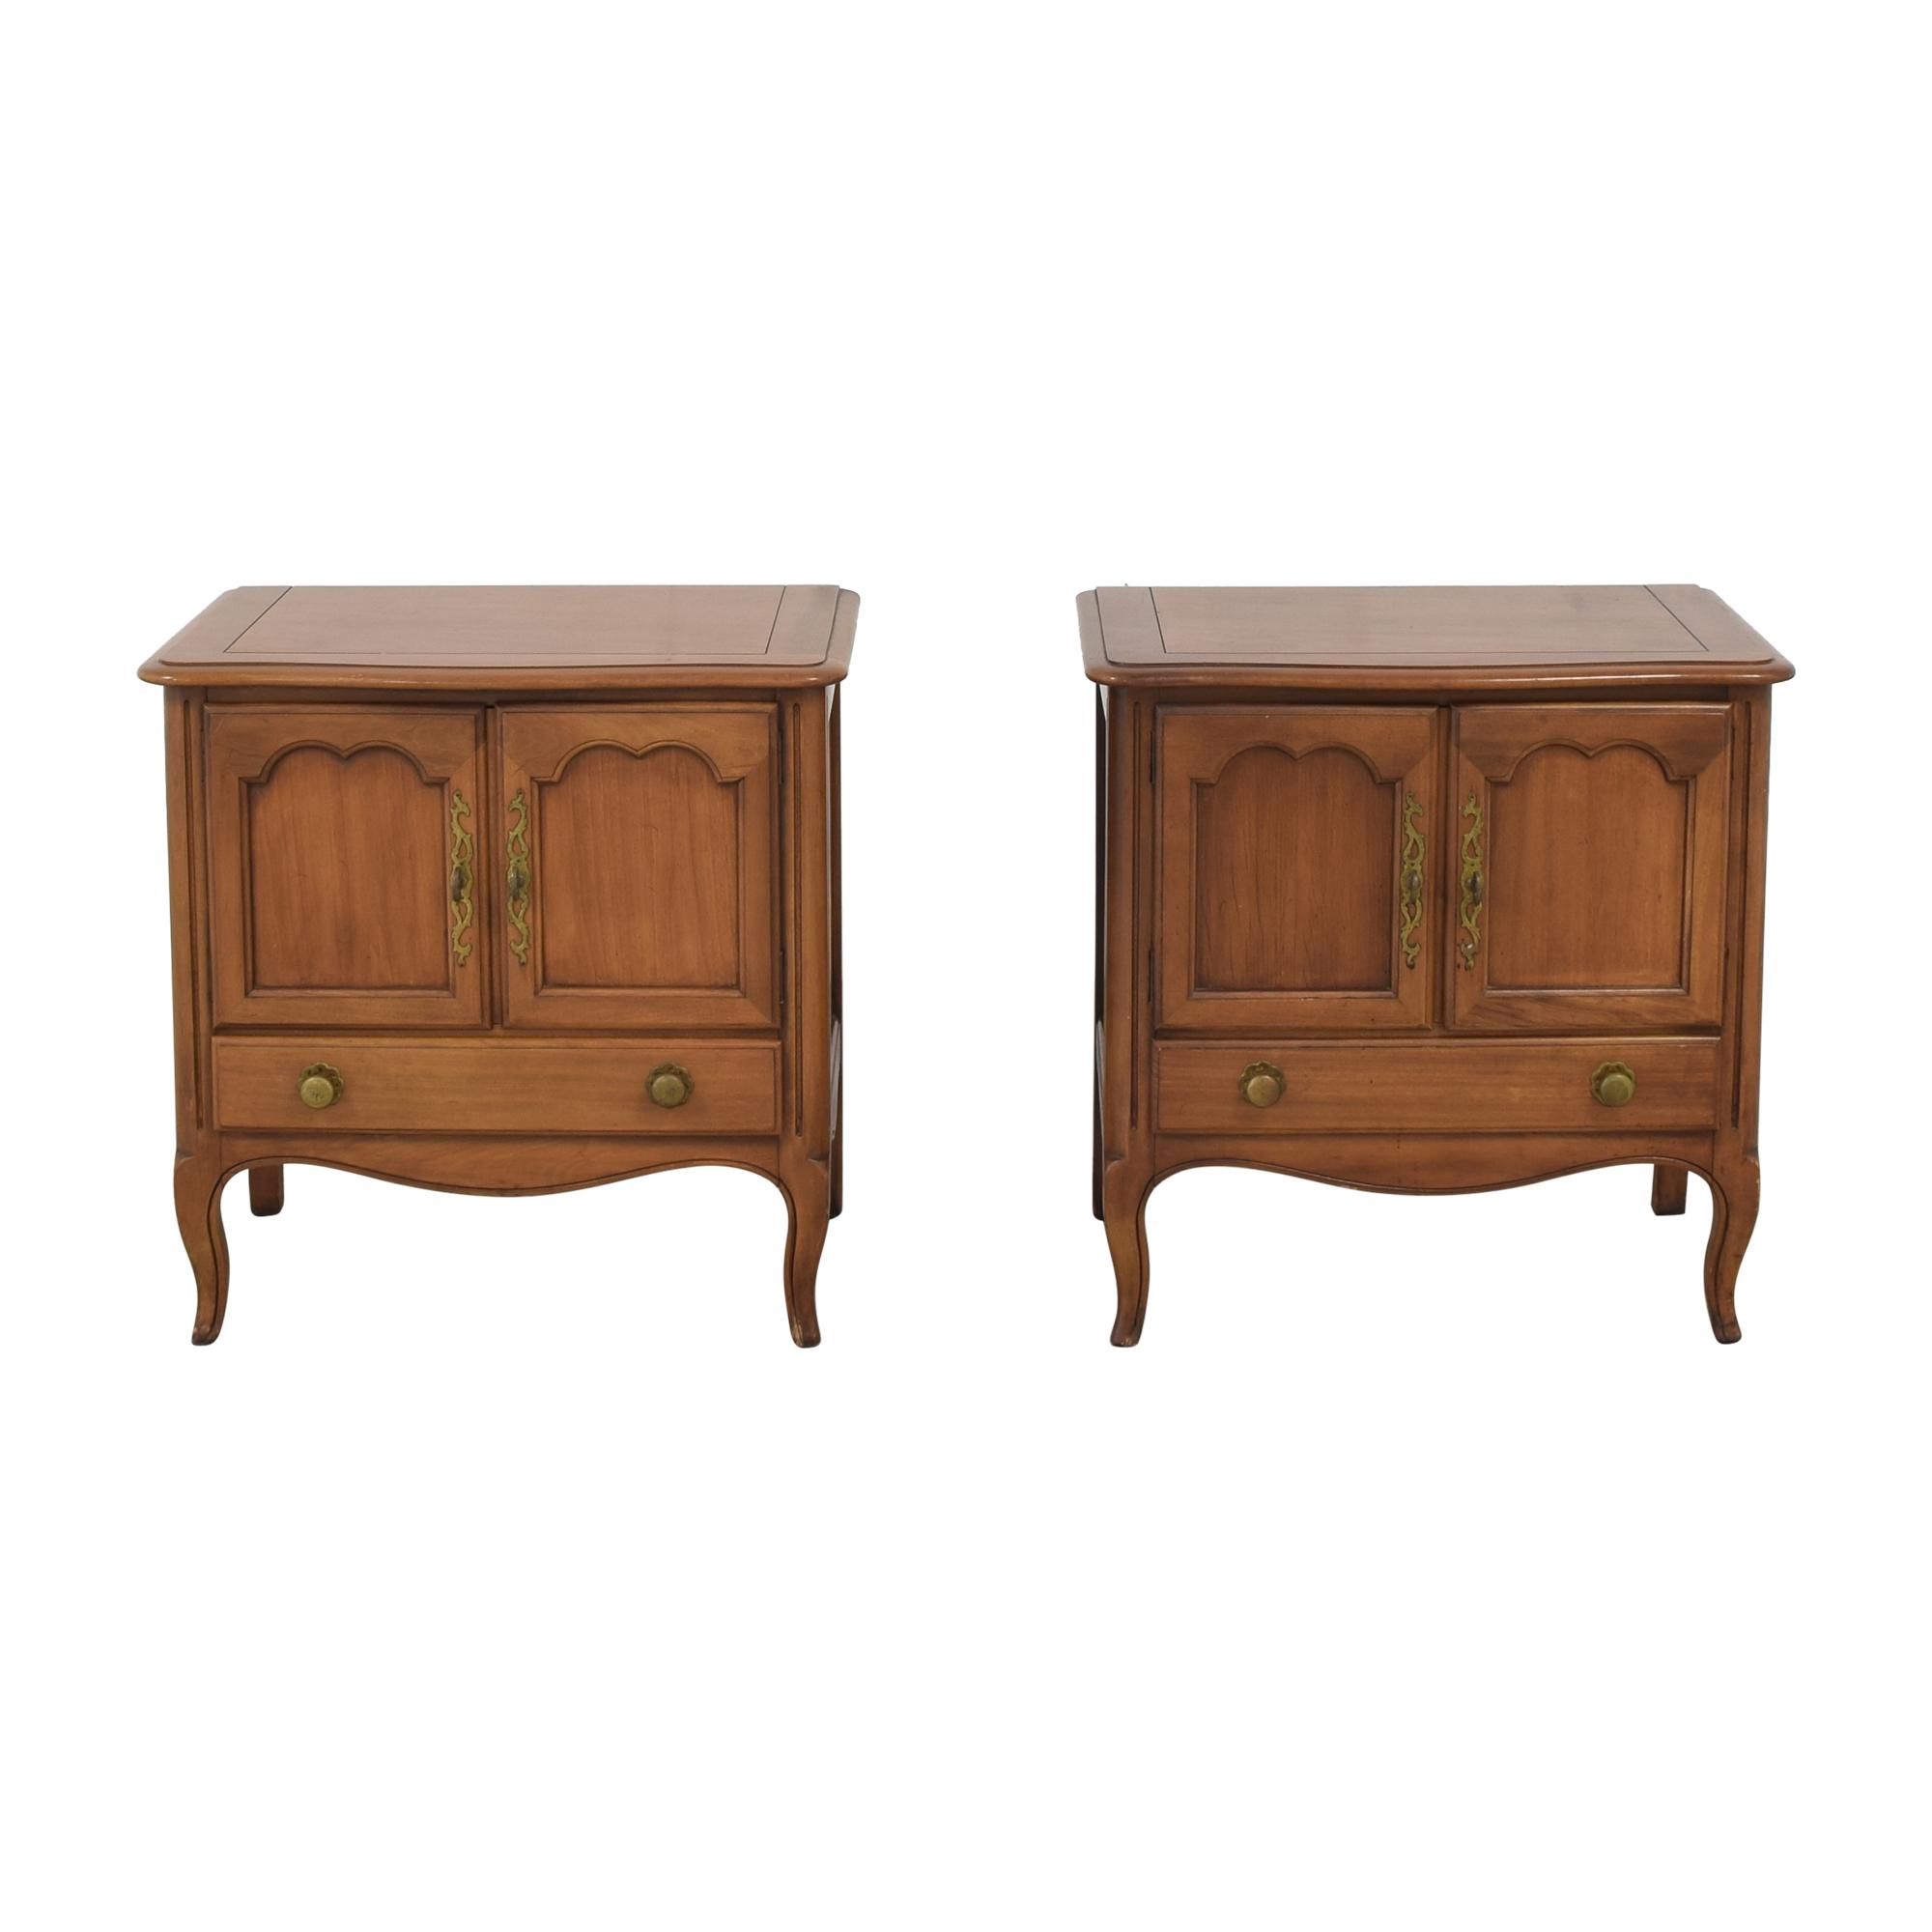 Century Furniture Century Furniture Nightstands discount